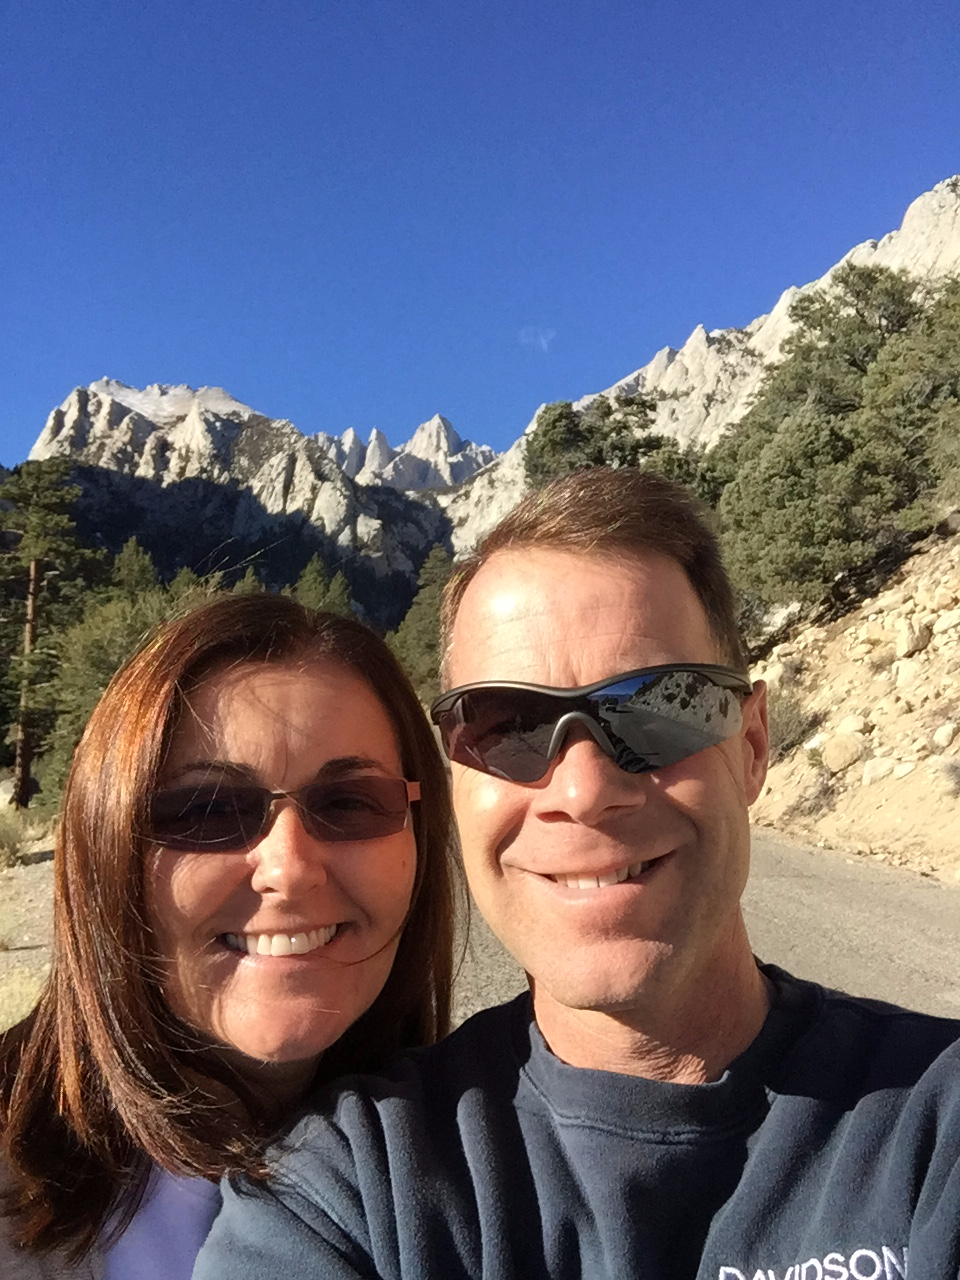 Jeff & Tami Davidson